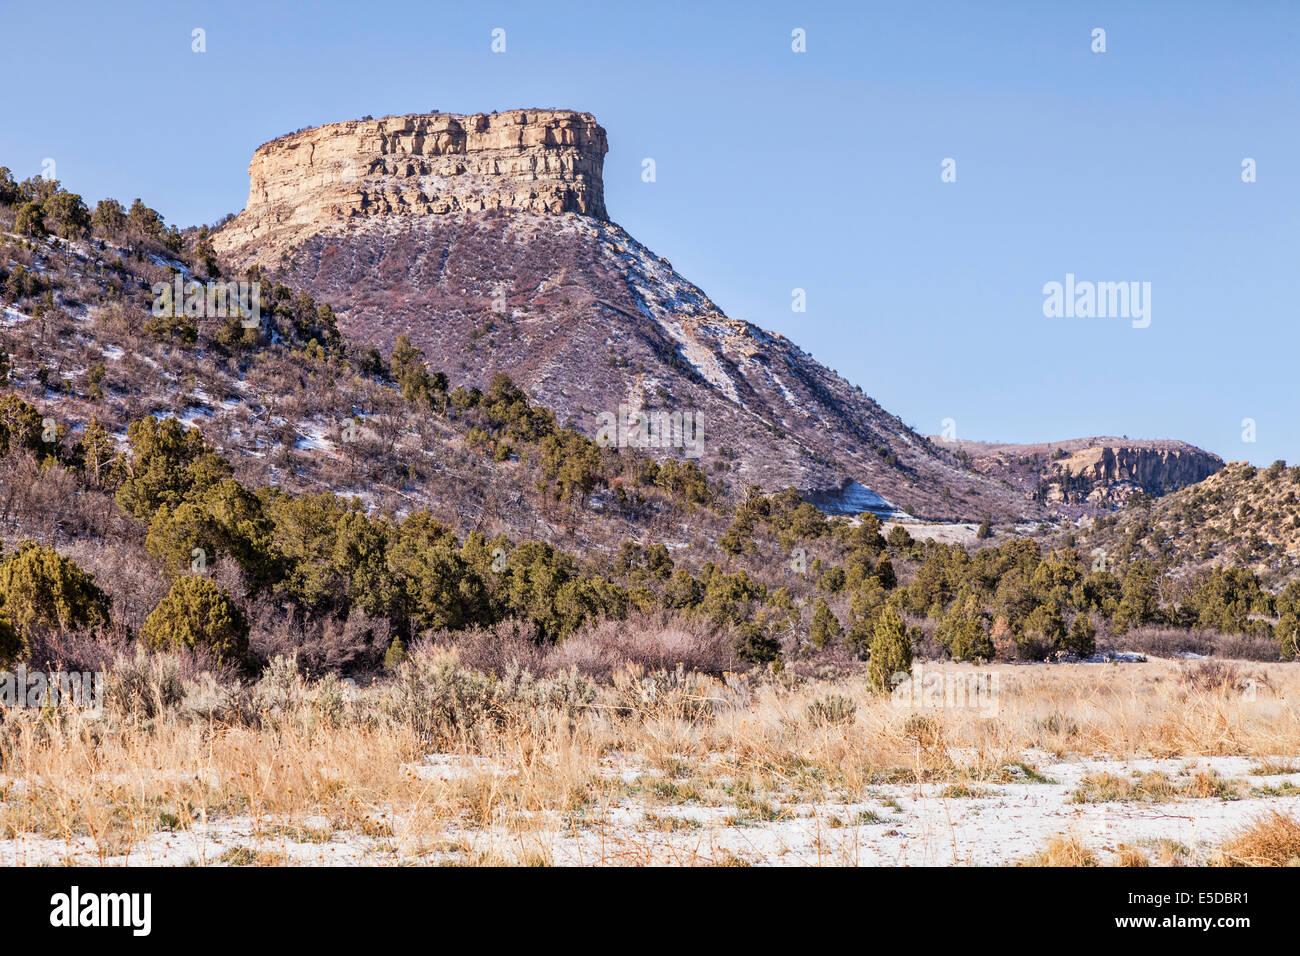 Mesa Verde National Park, Colorado. - Stock Image